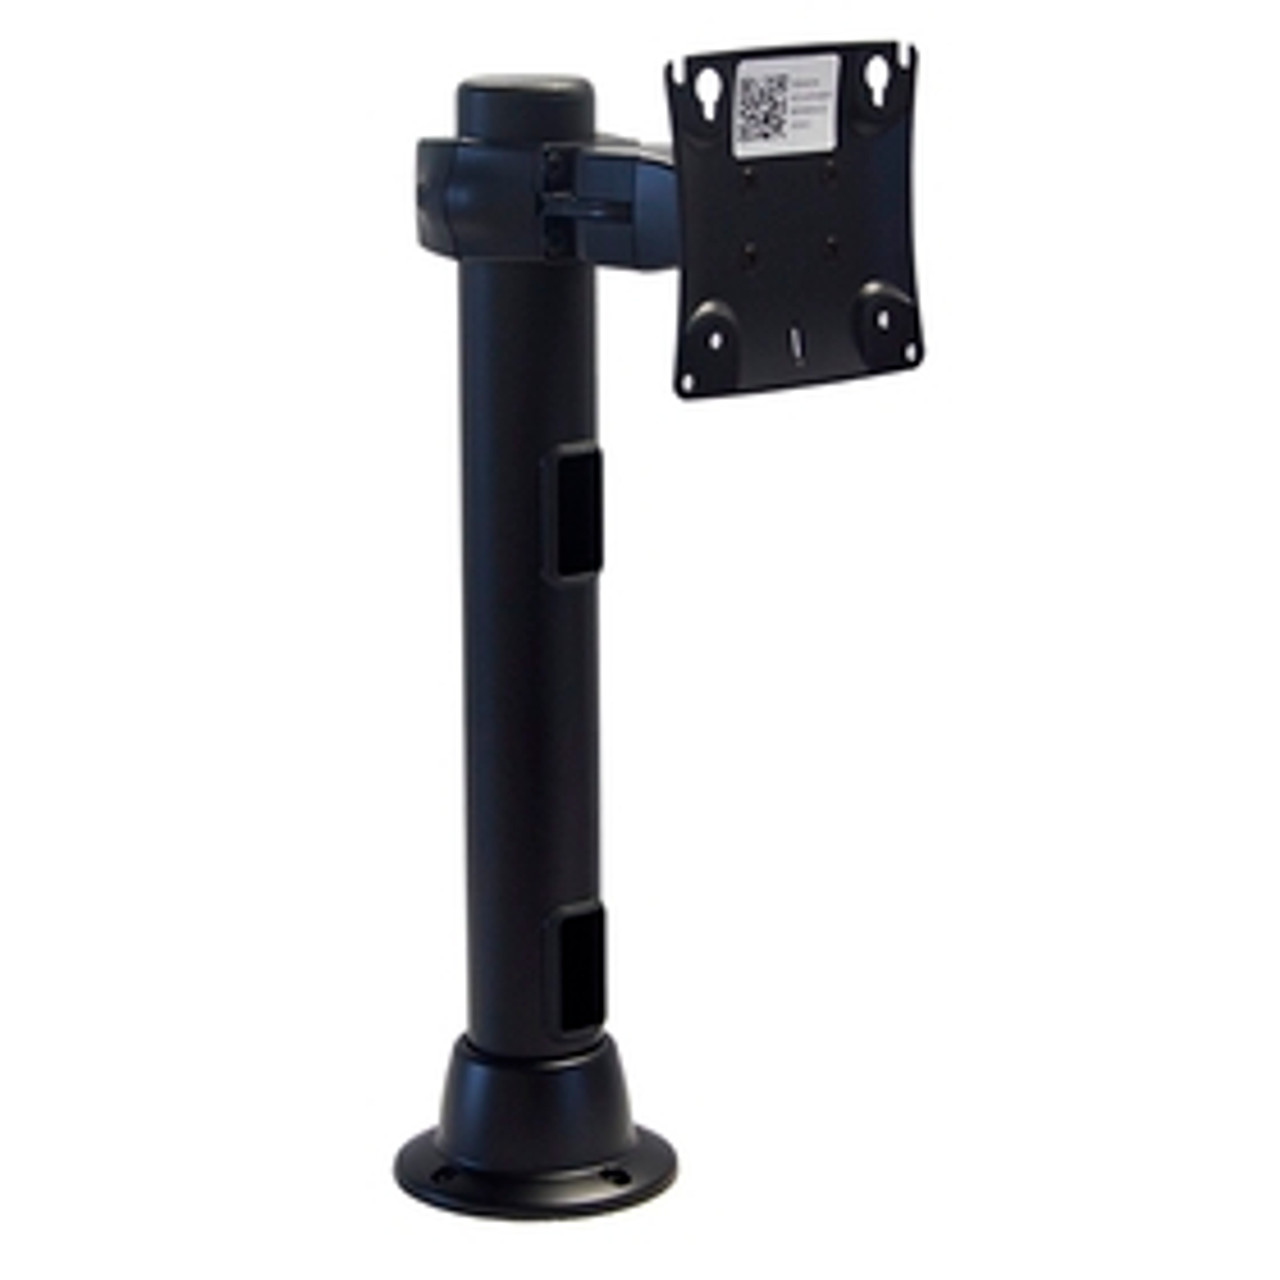 POS Preconfigured Monitor Mount Double Pivot Grommet 16 inch Pole